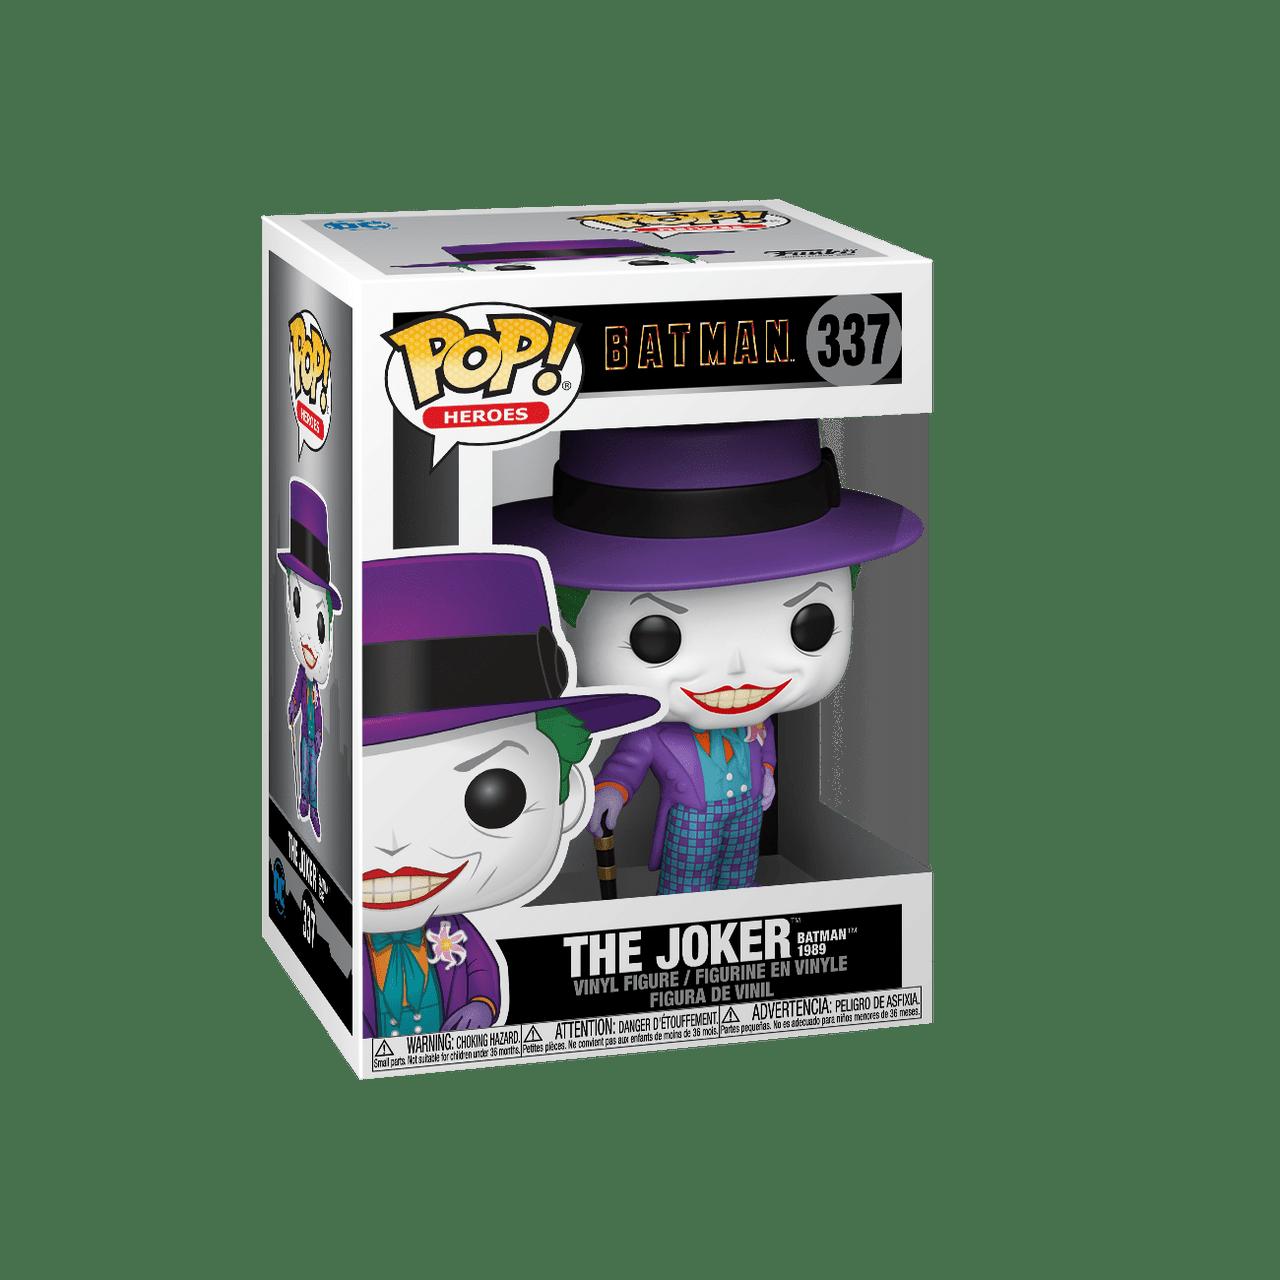 POP! Heroes ~ Batman 1989 ~ The Joker #337